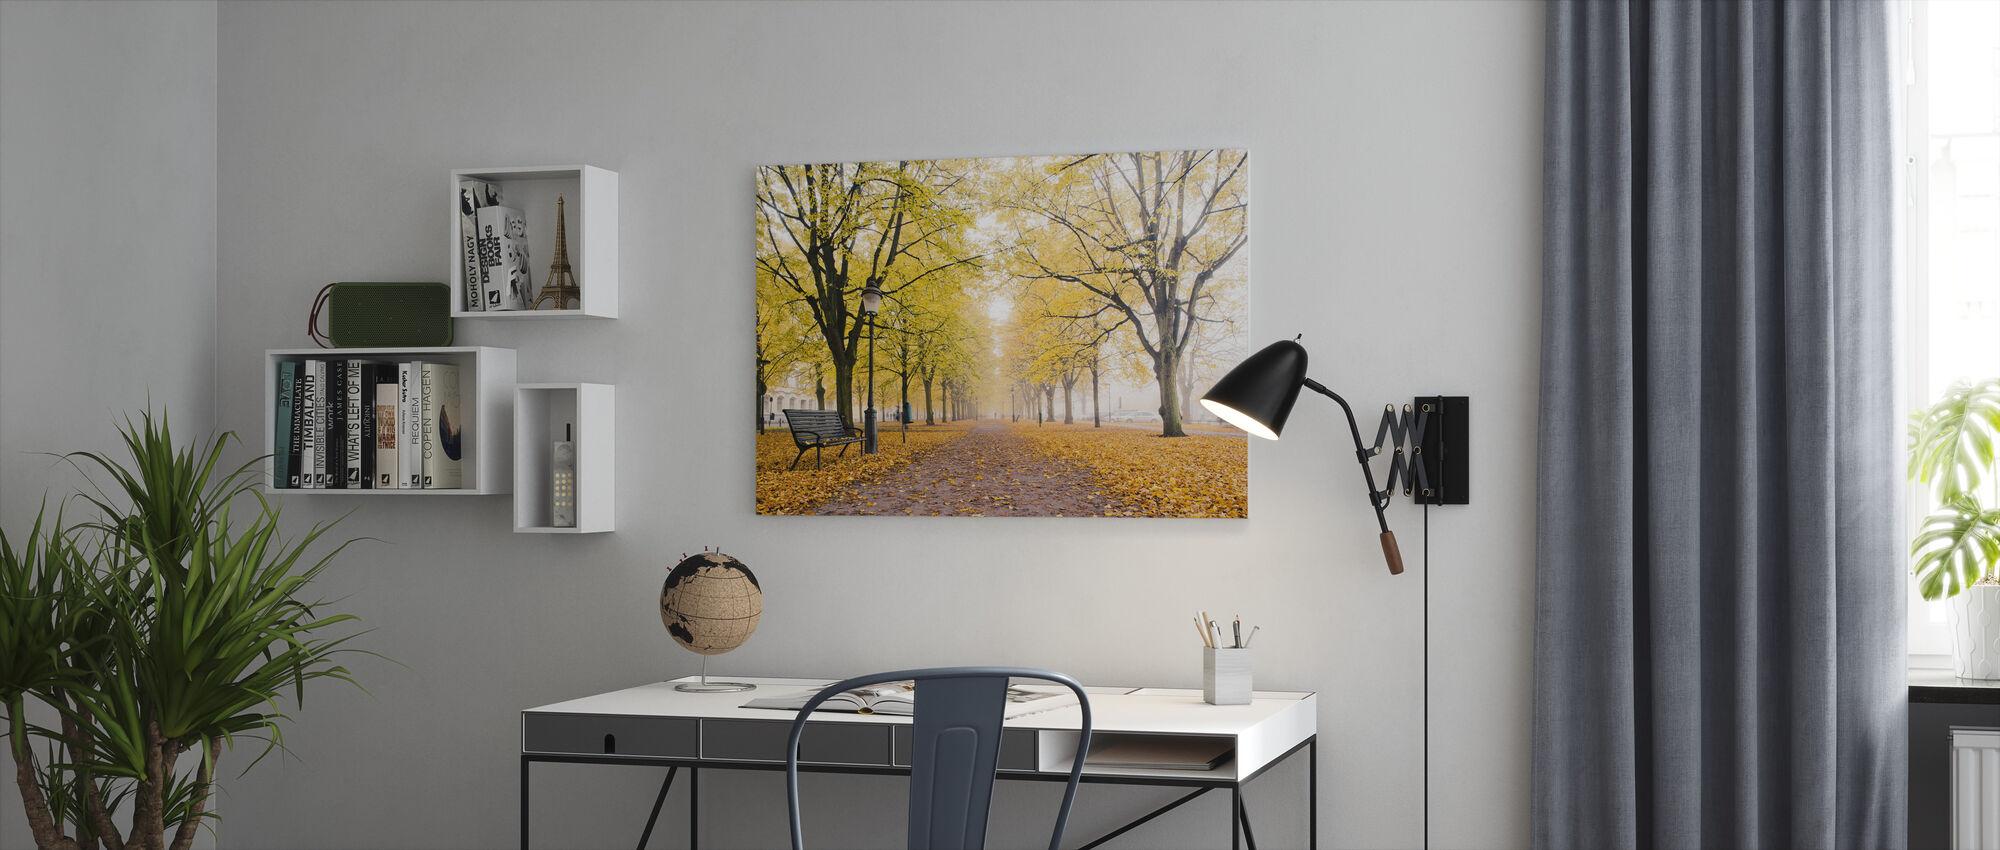 Malmo Alley - Canvas print - Office